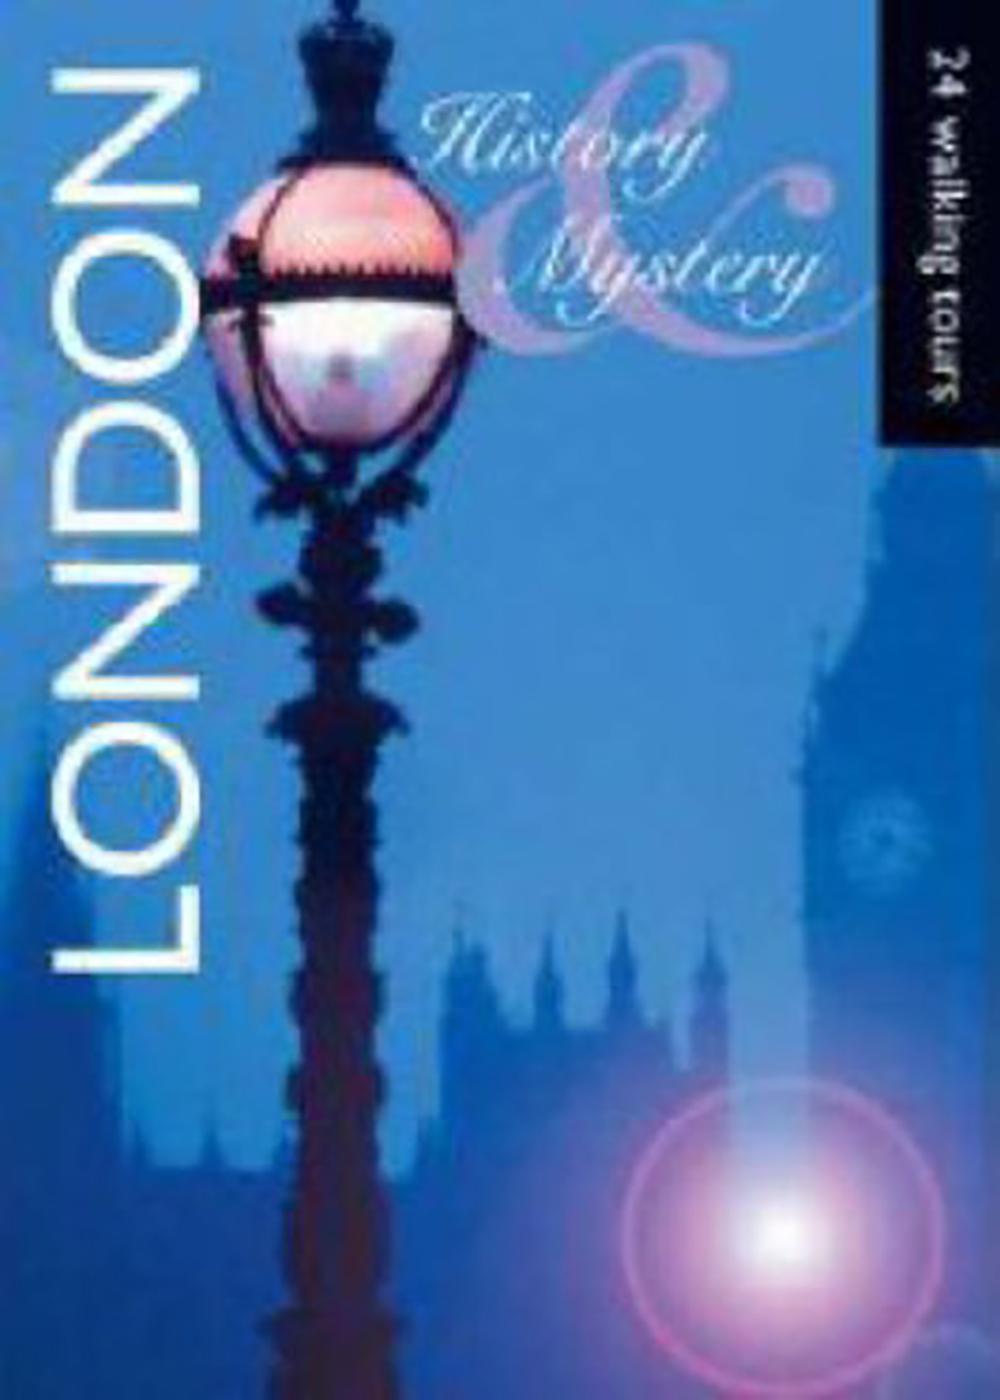 AA Publishing - London. History & Mystery